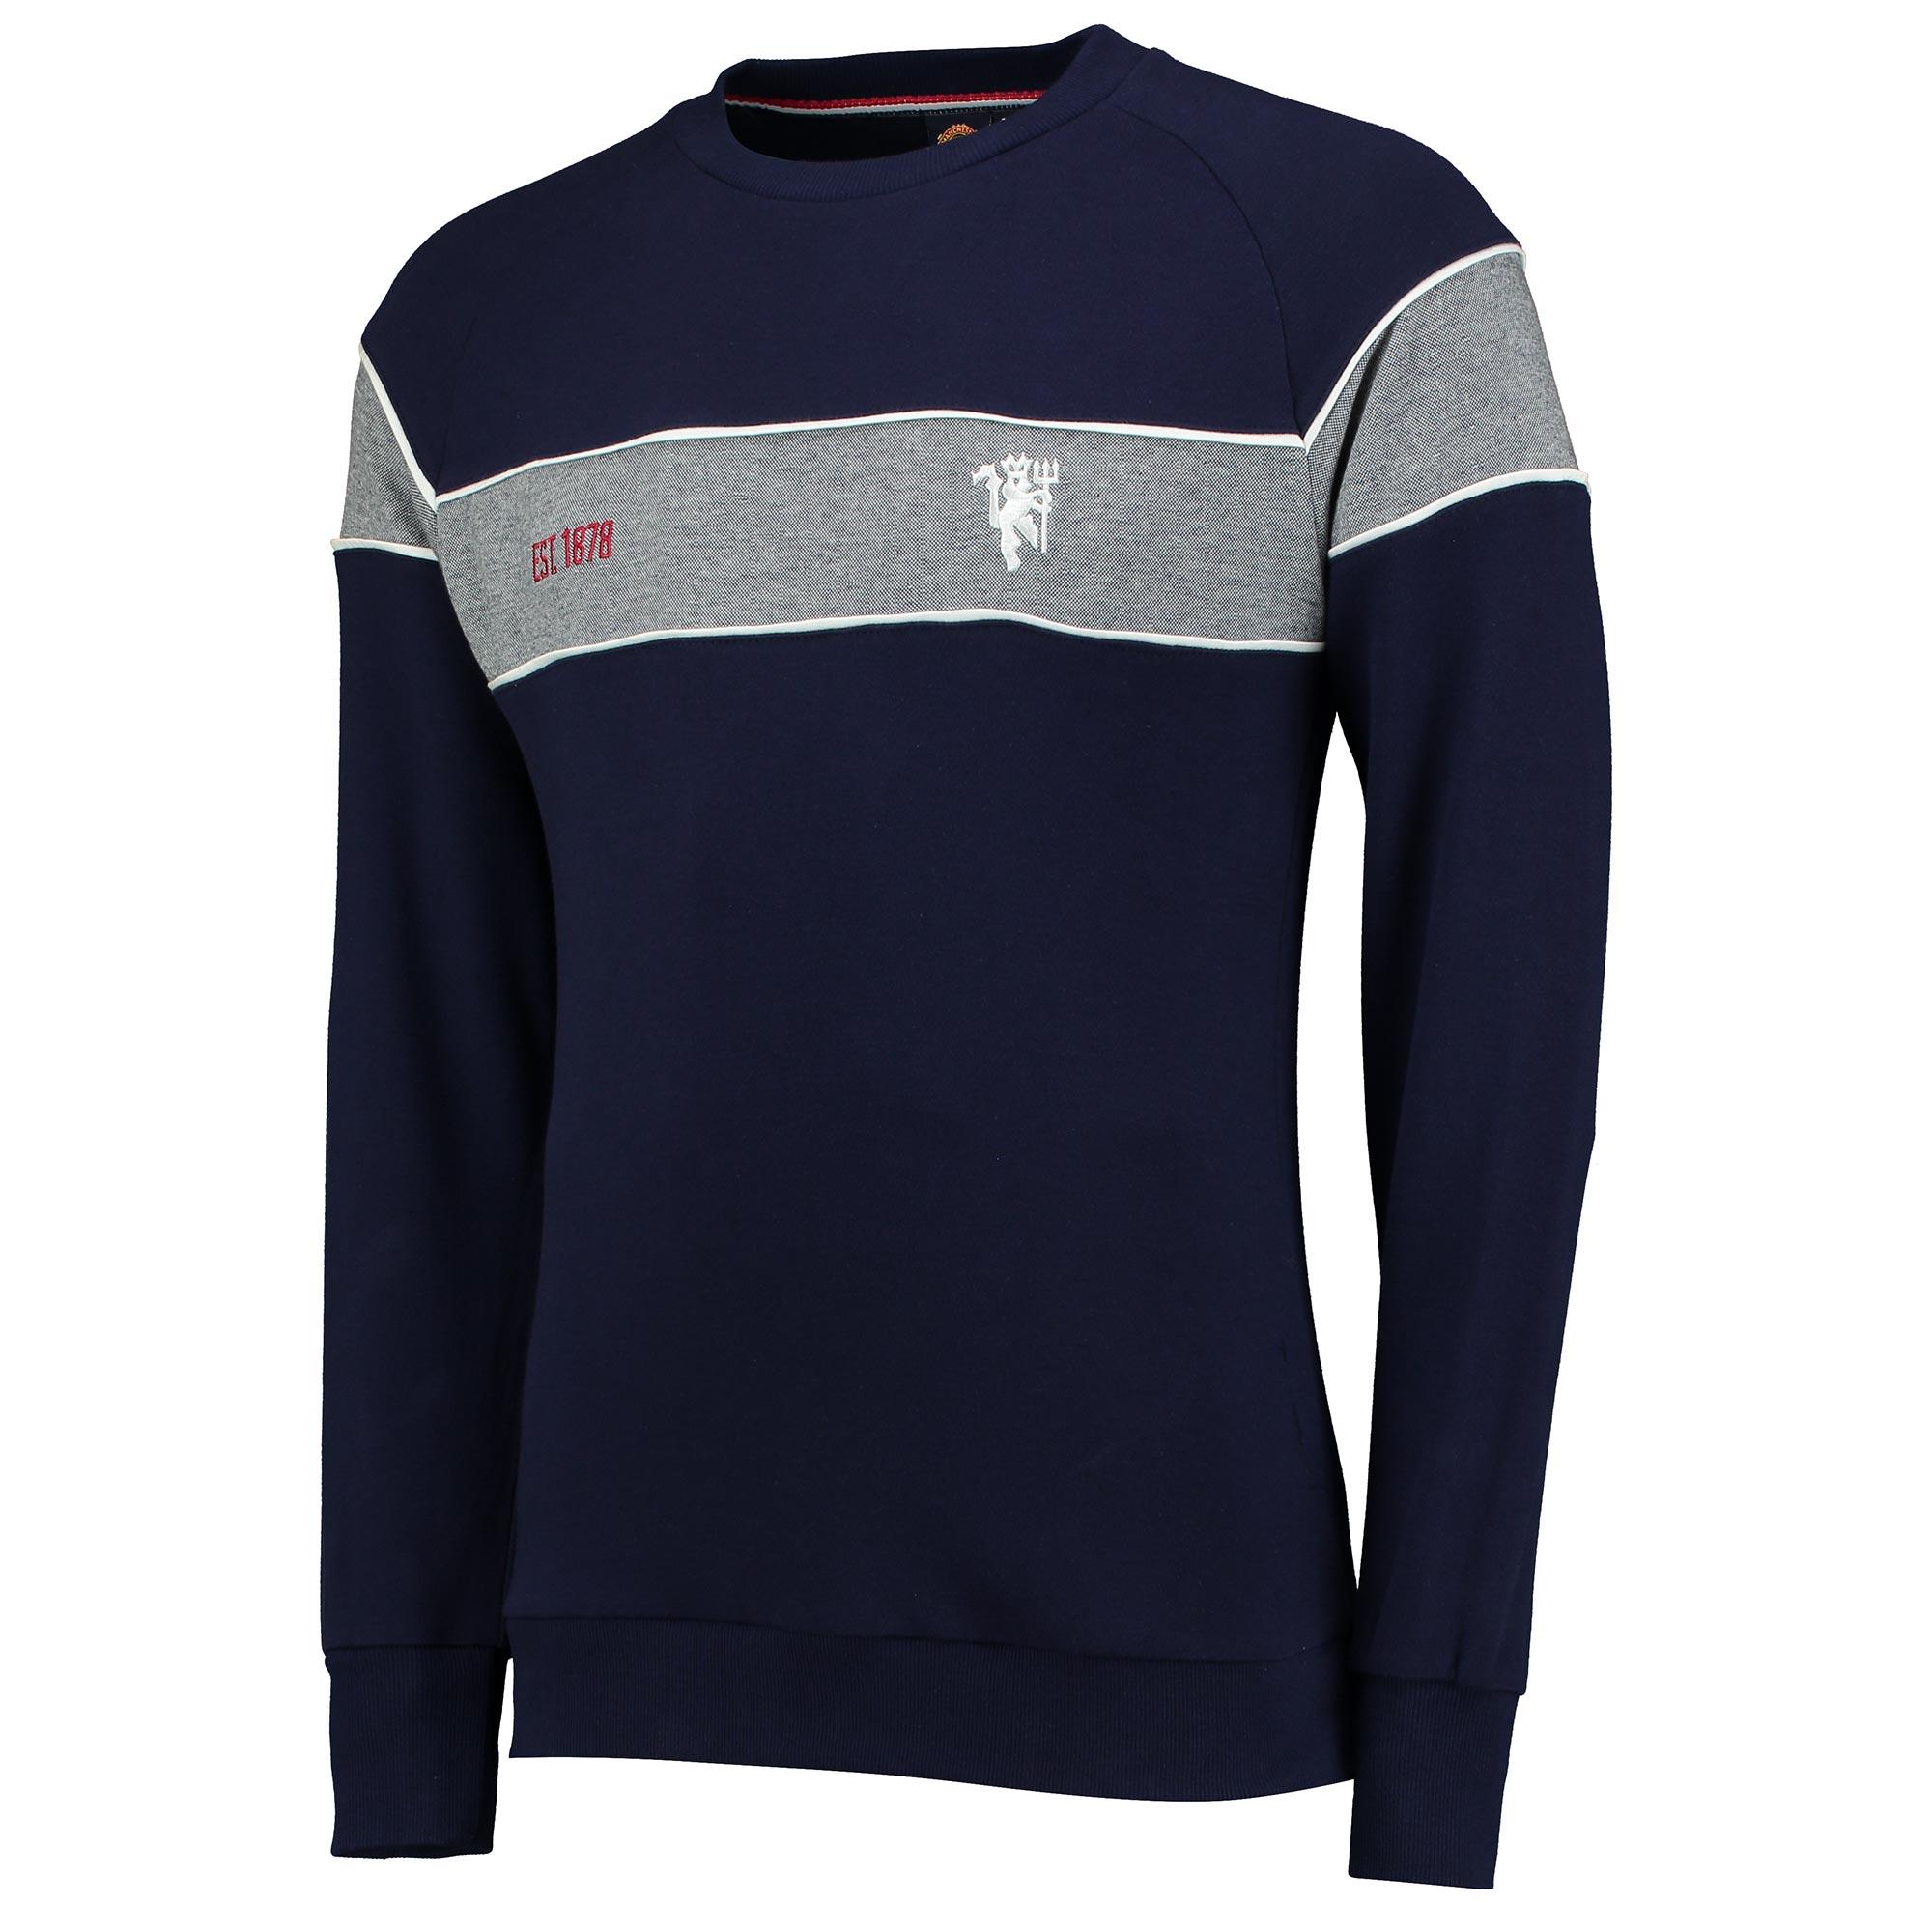 Manchester United Premium Devil Panelled Crew Neck Sweater - Navy - Me